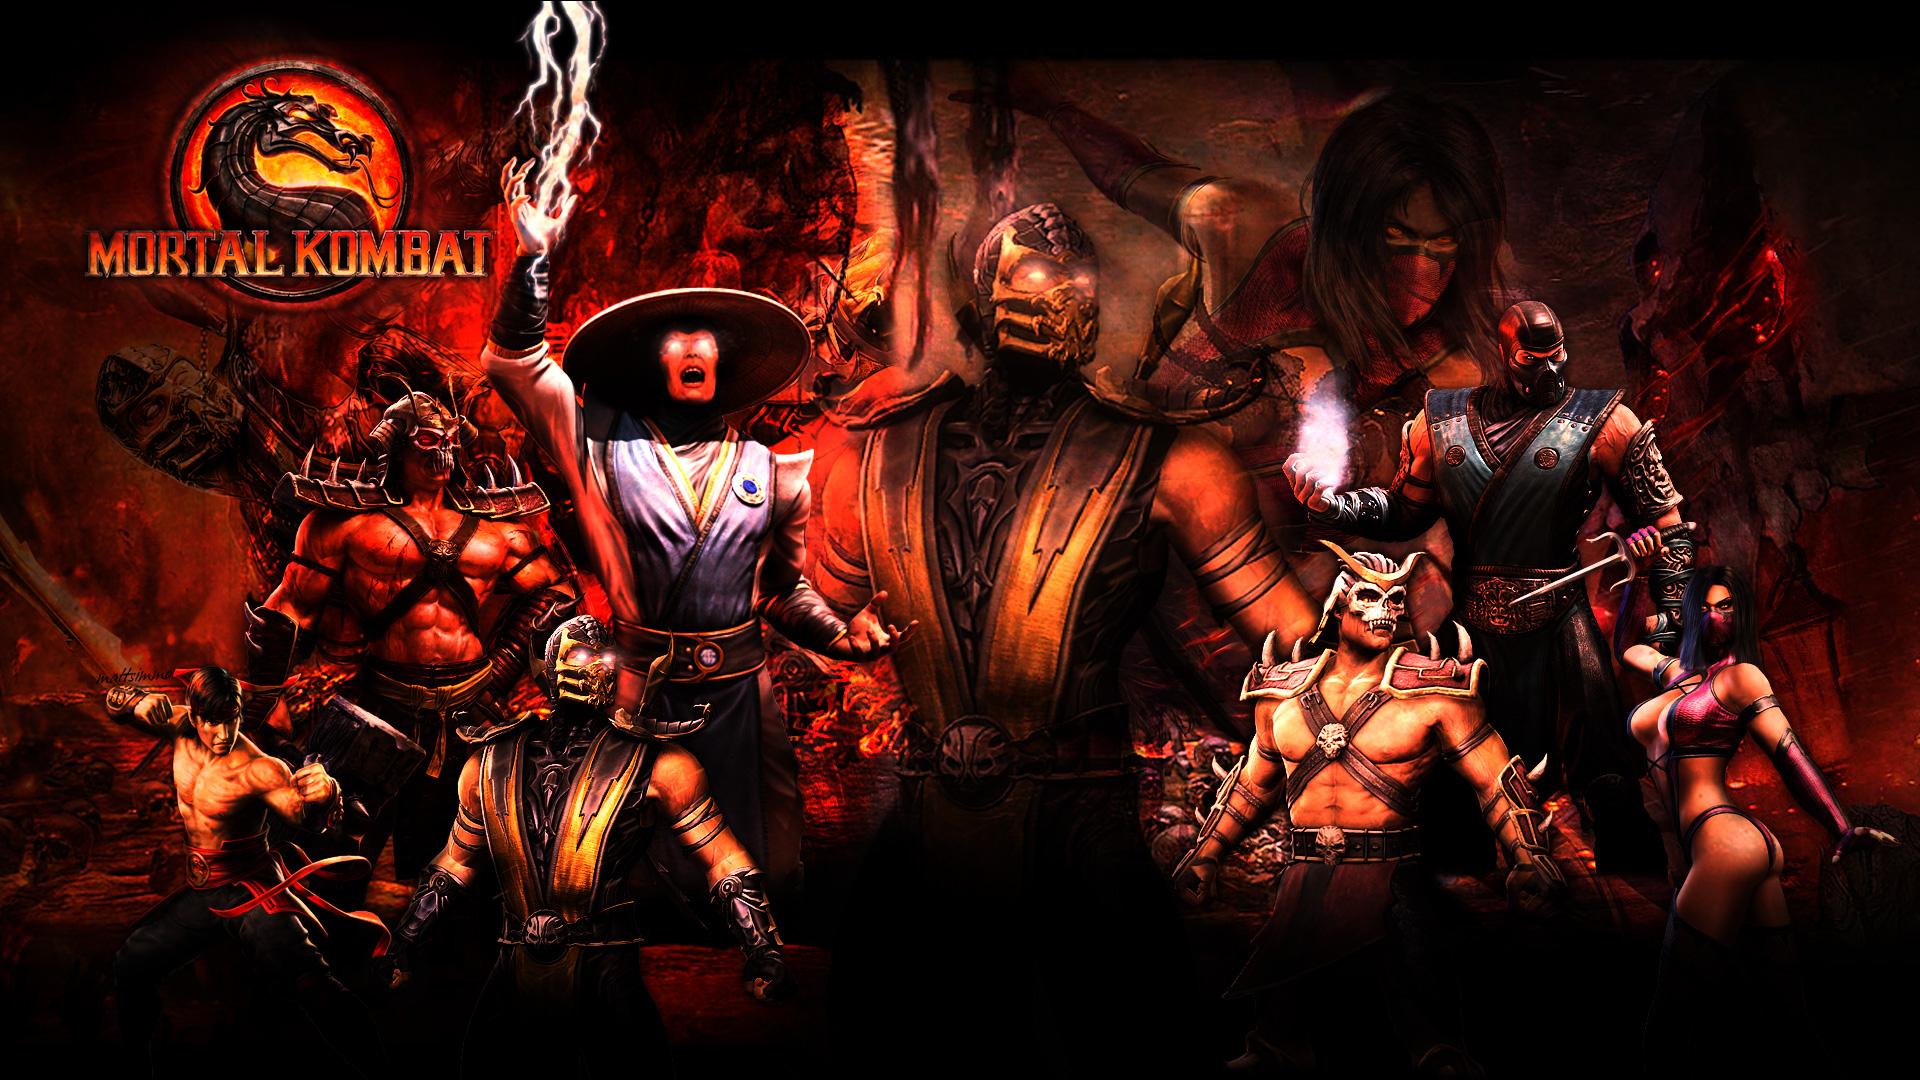 Pin Mortal Kombat 9 Wallpapers In Hd Page 4 Dragon Wallpaper on 1920x1080